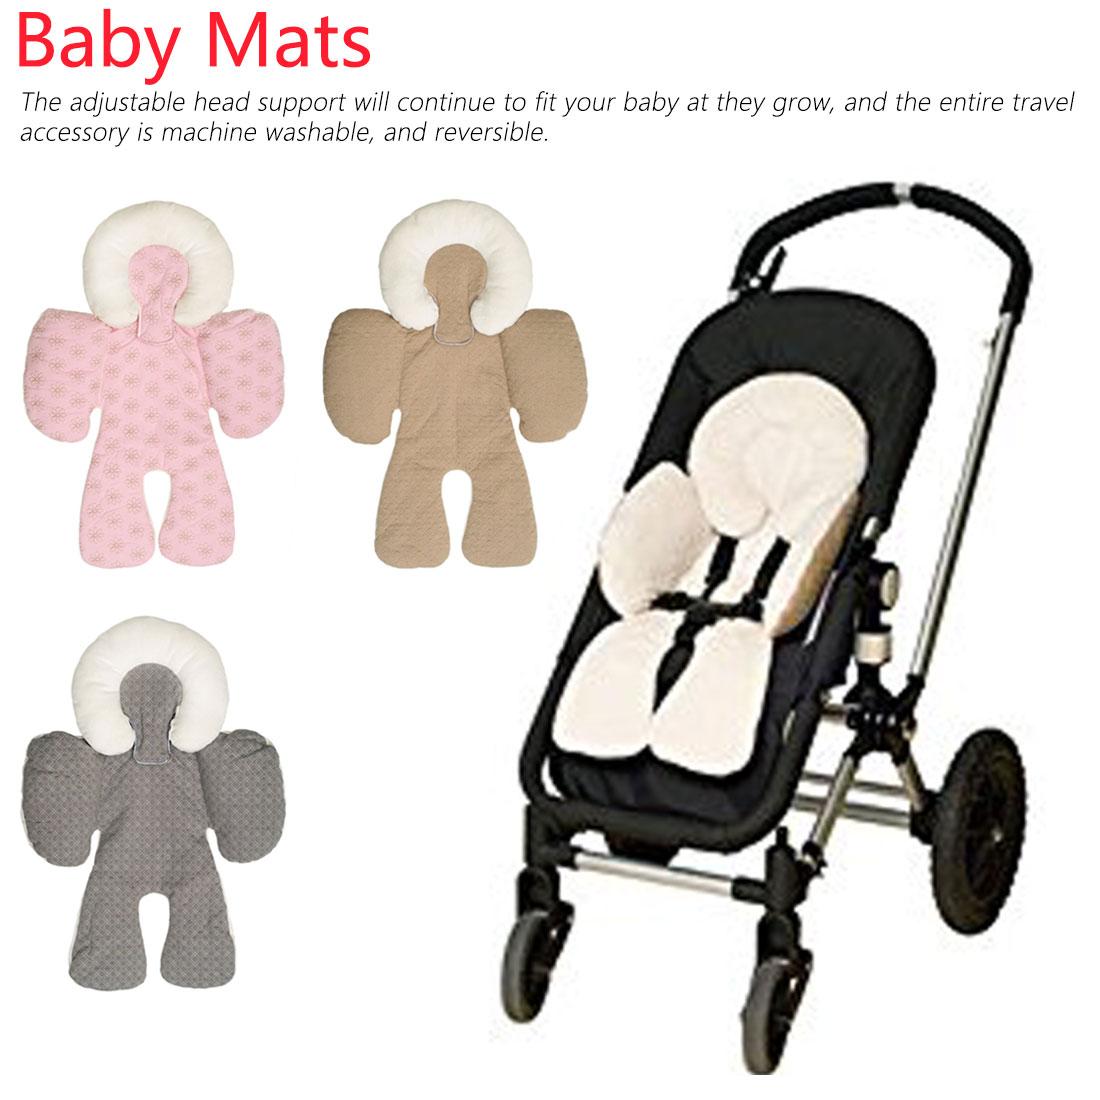 Baby Stroller Cushion Car Seat Accessories Pram Thermal Mattress Liner Mat Infant Shoulder Belt Strap Cover Neck Protection Pad